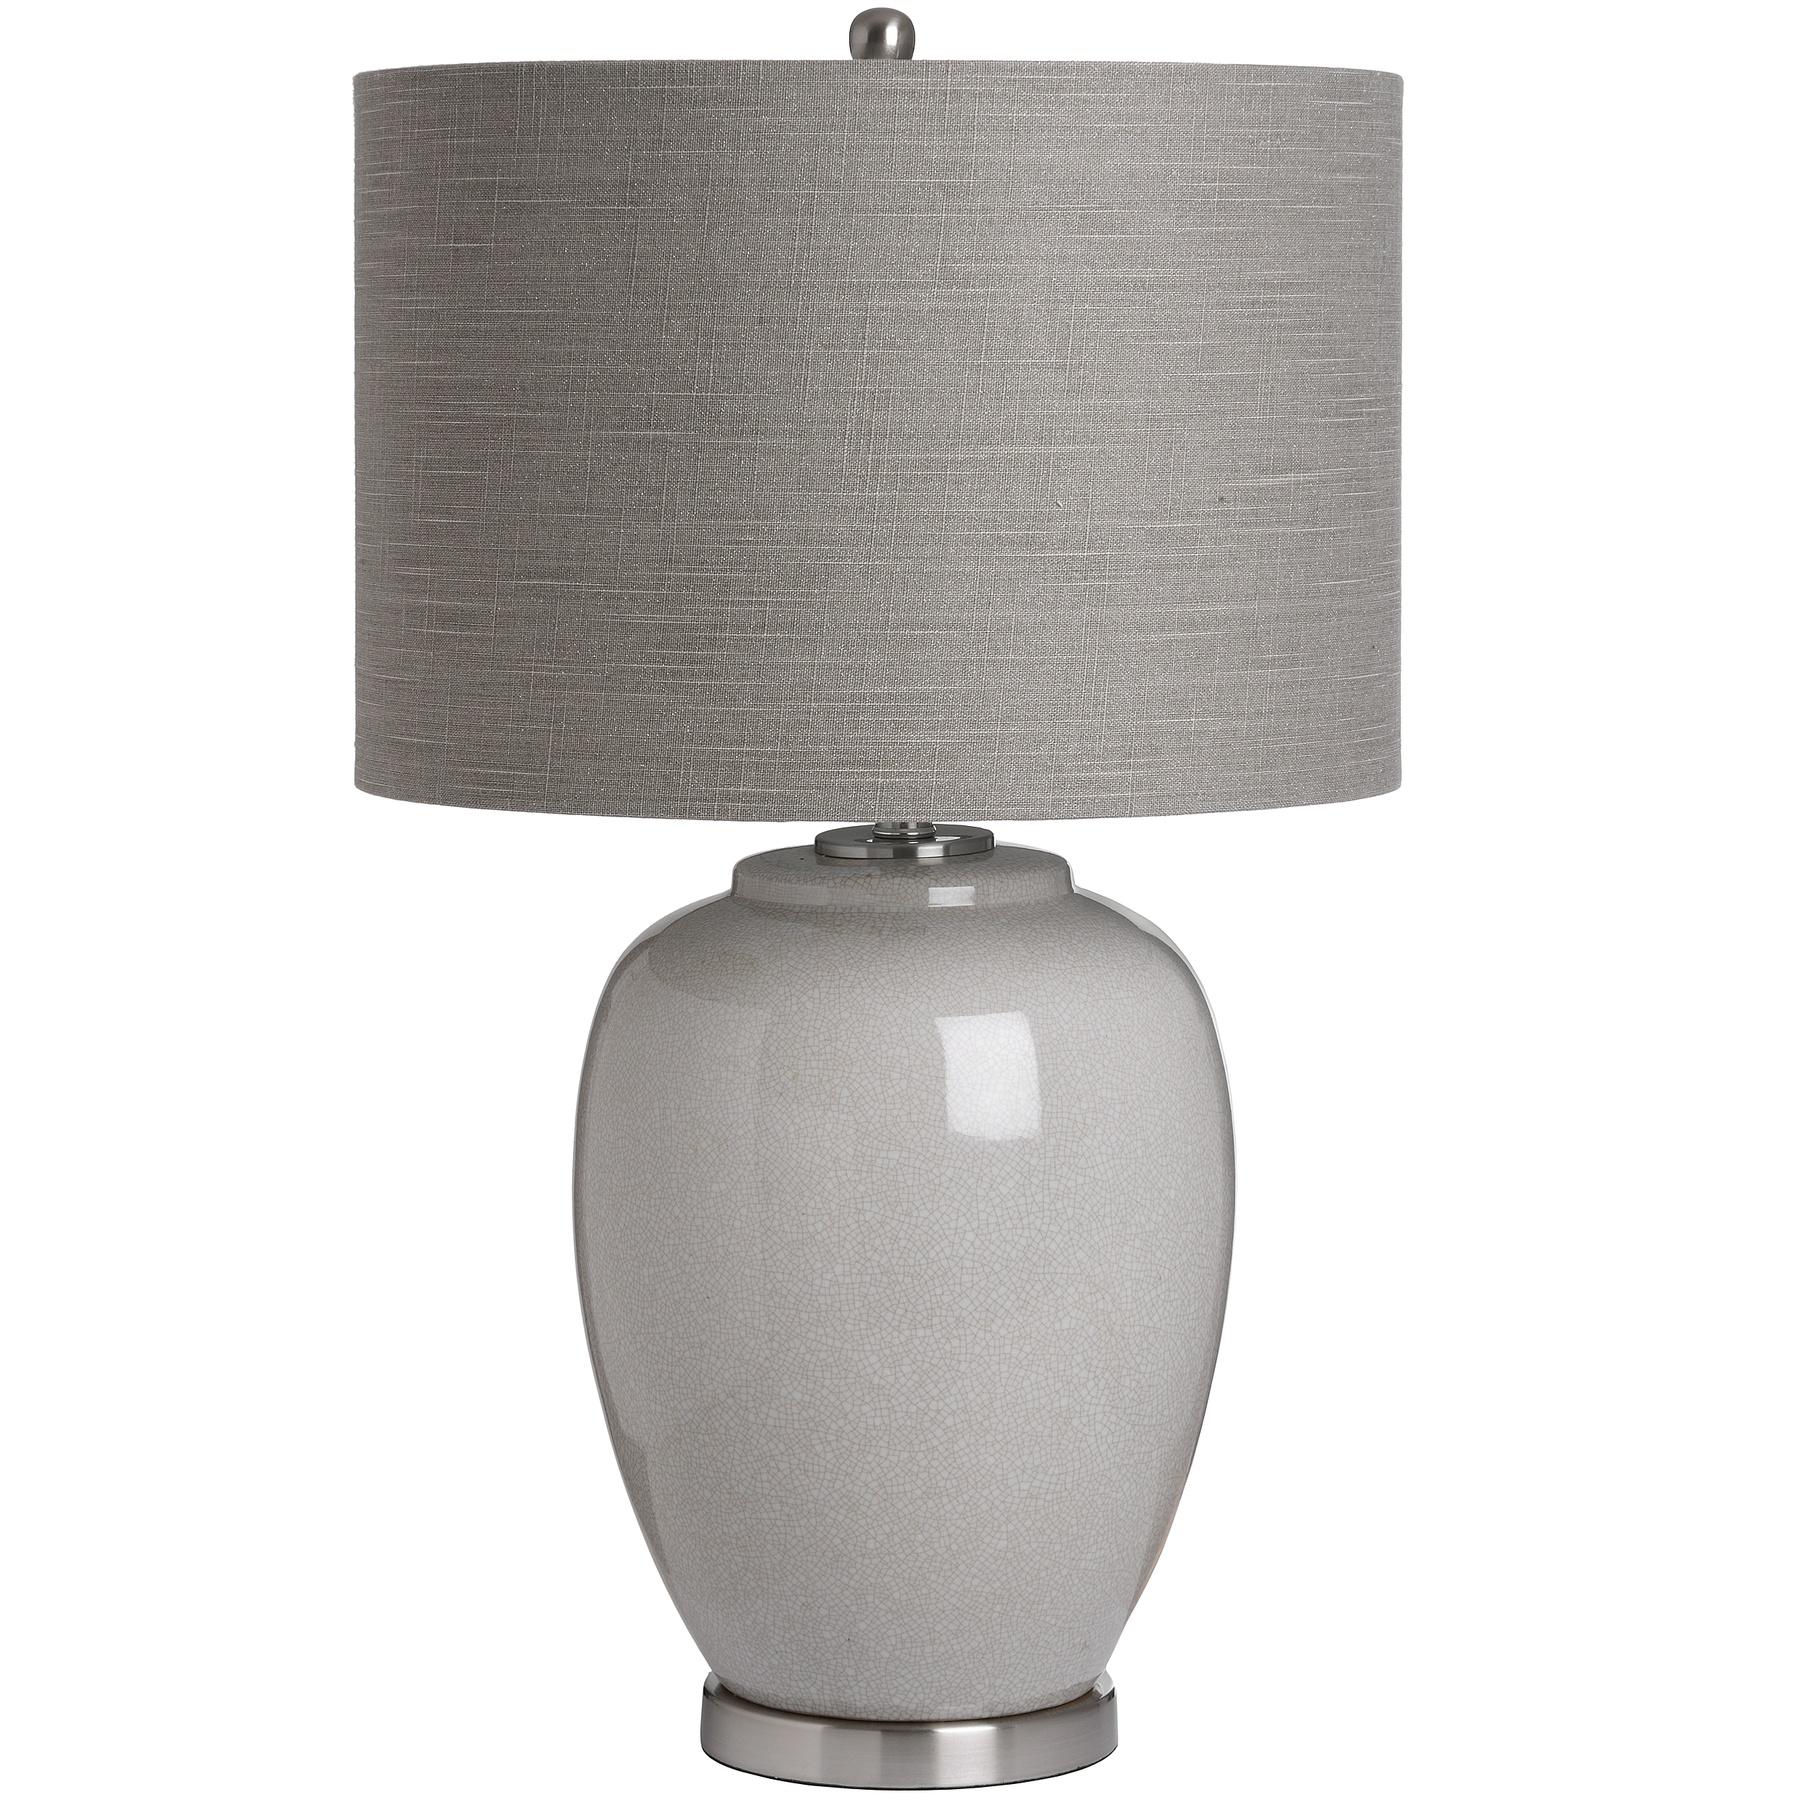 Large Belmont Ceramic Table Lamp